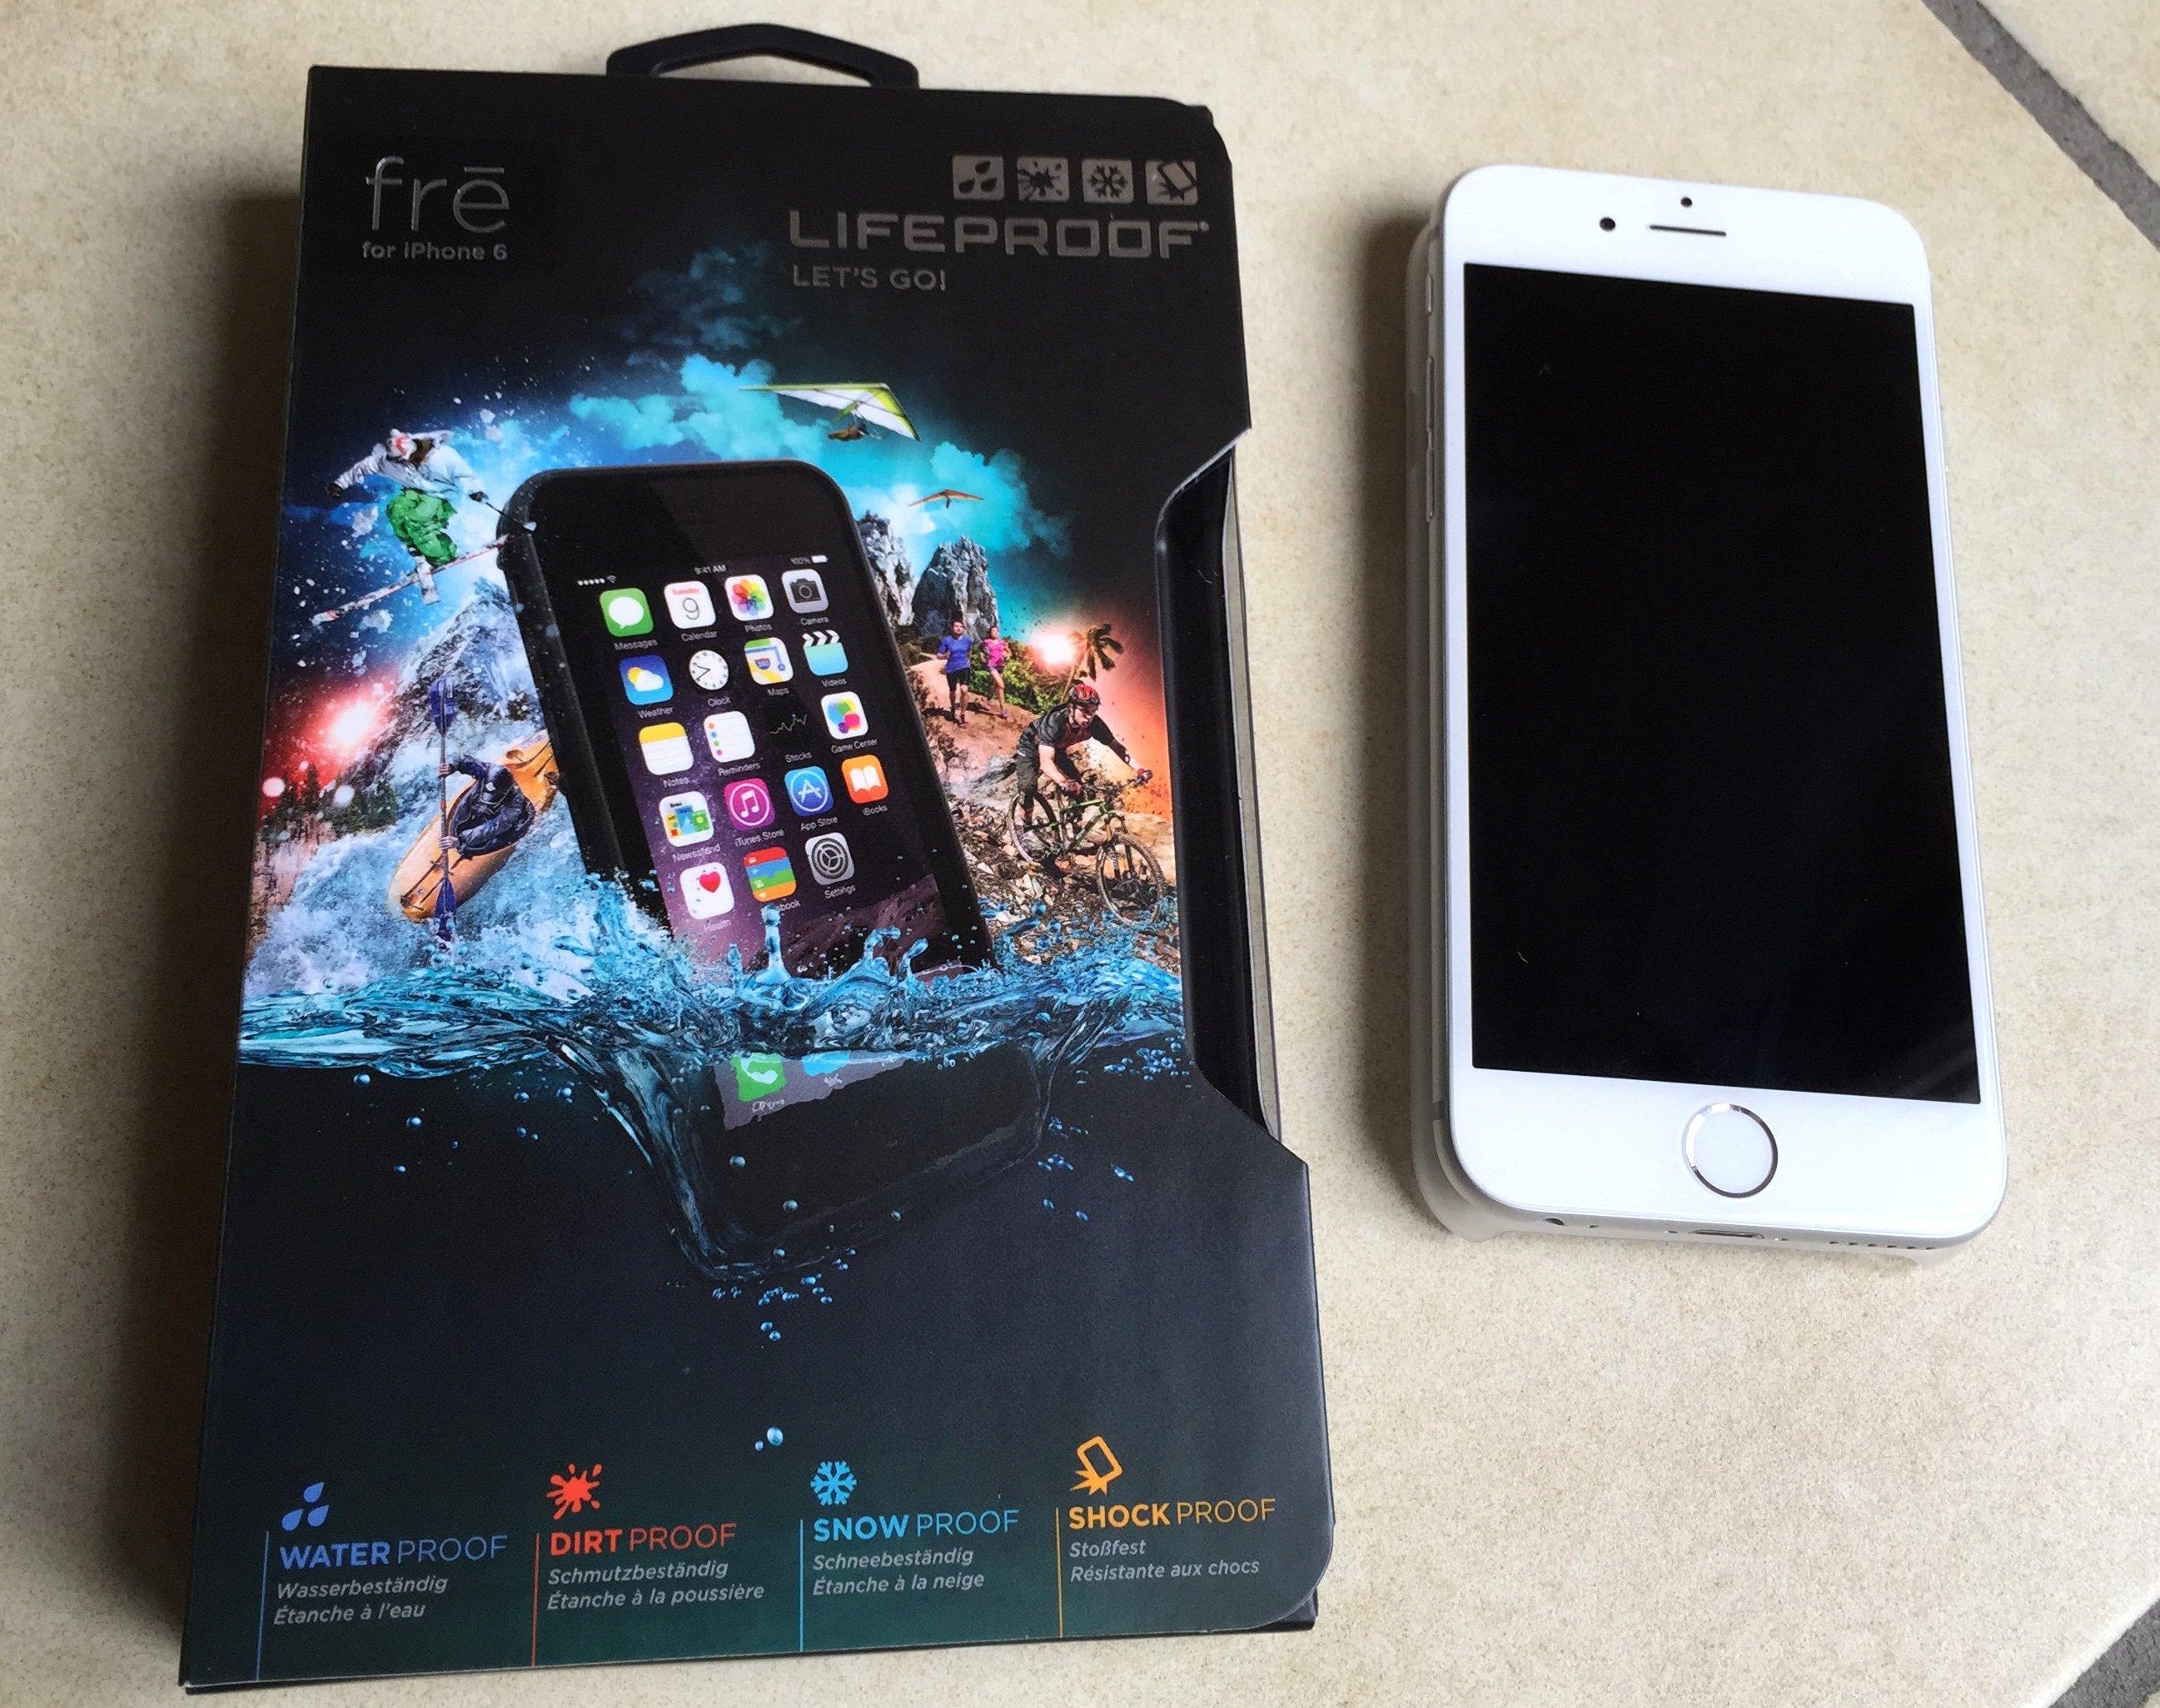 iphone 6 coque lifeproof